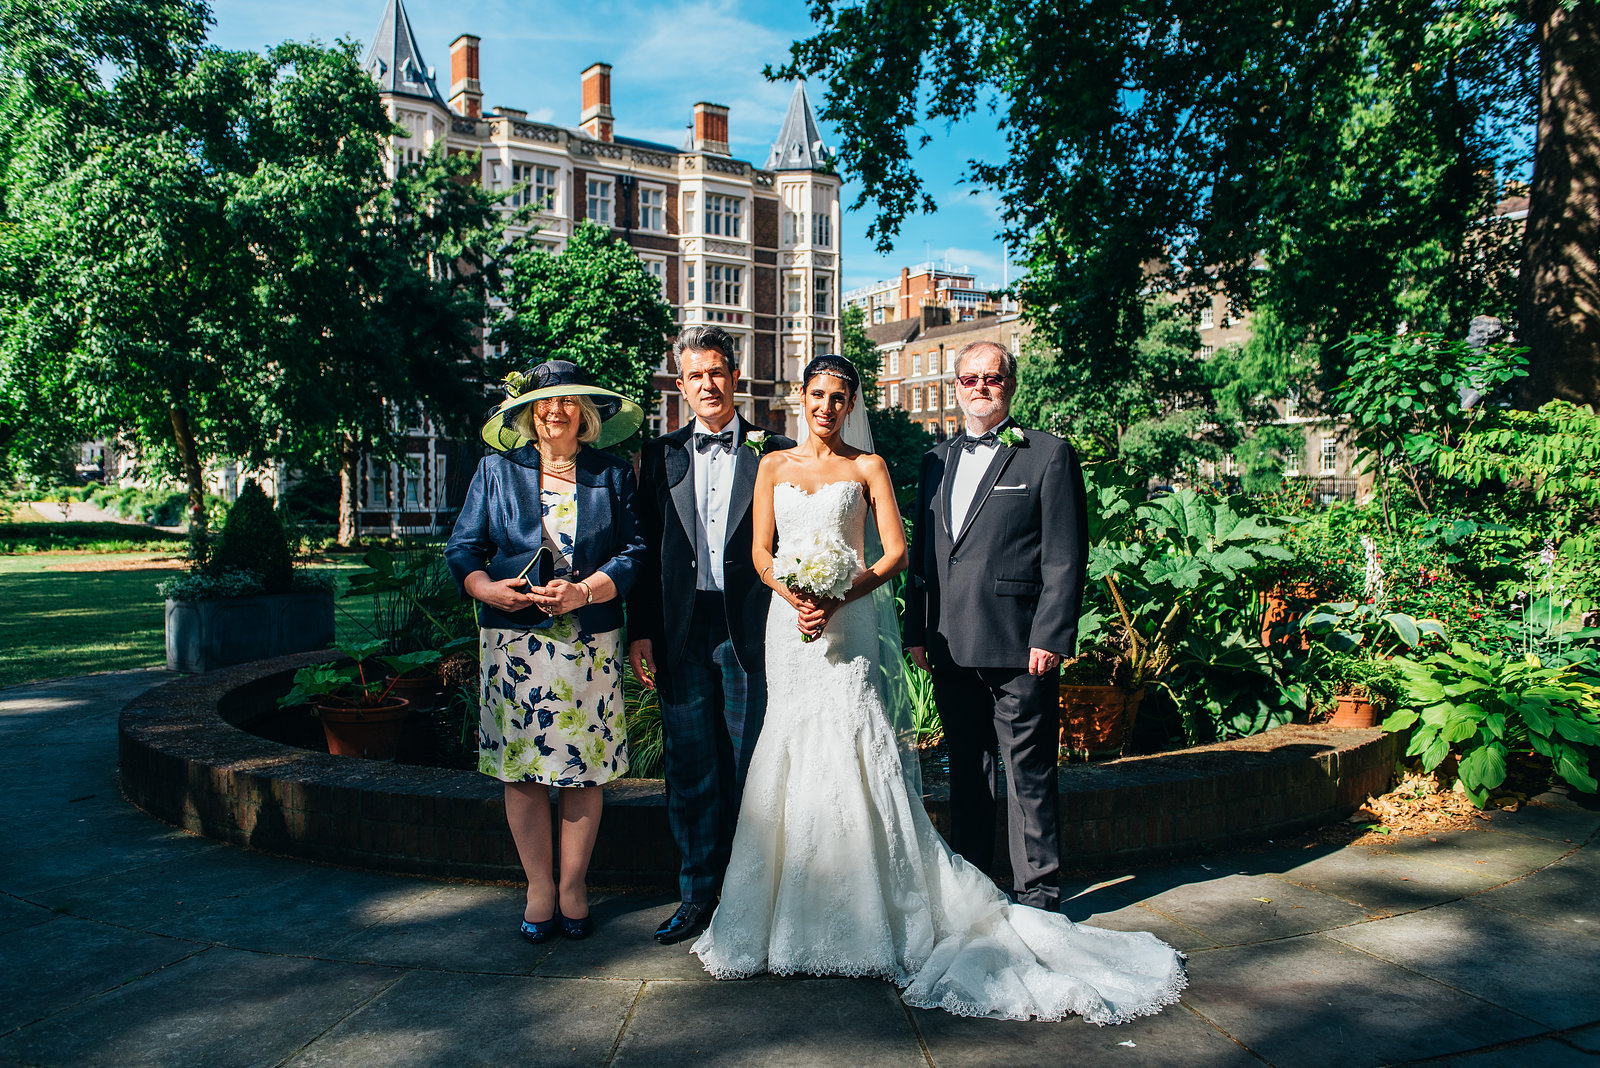 Elizabeth & Graham's Wedding, July 2015